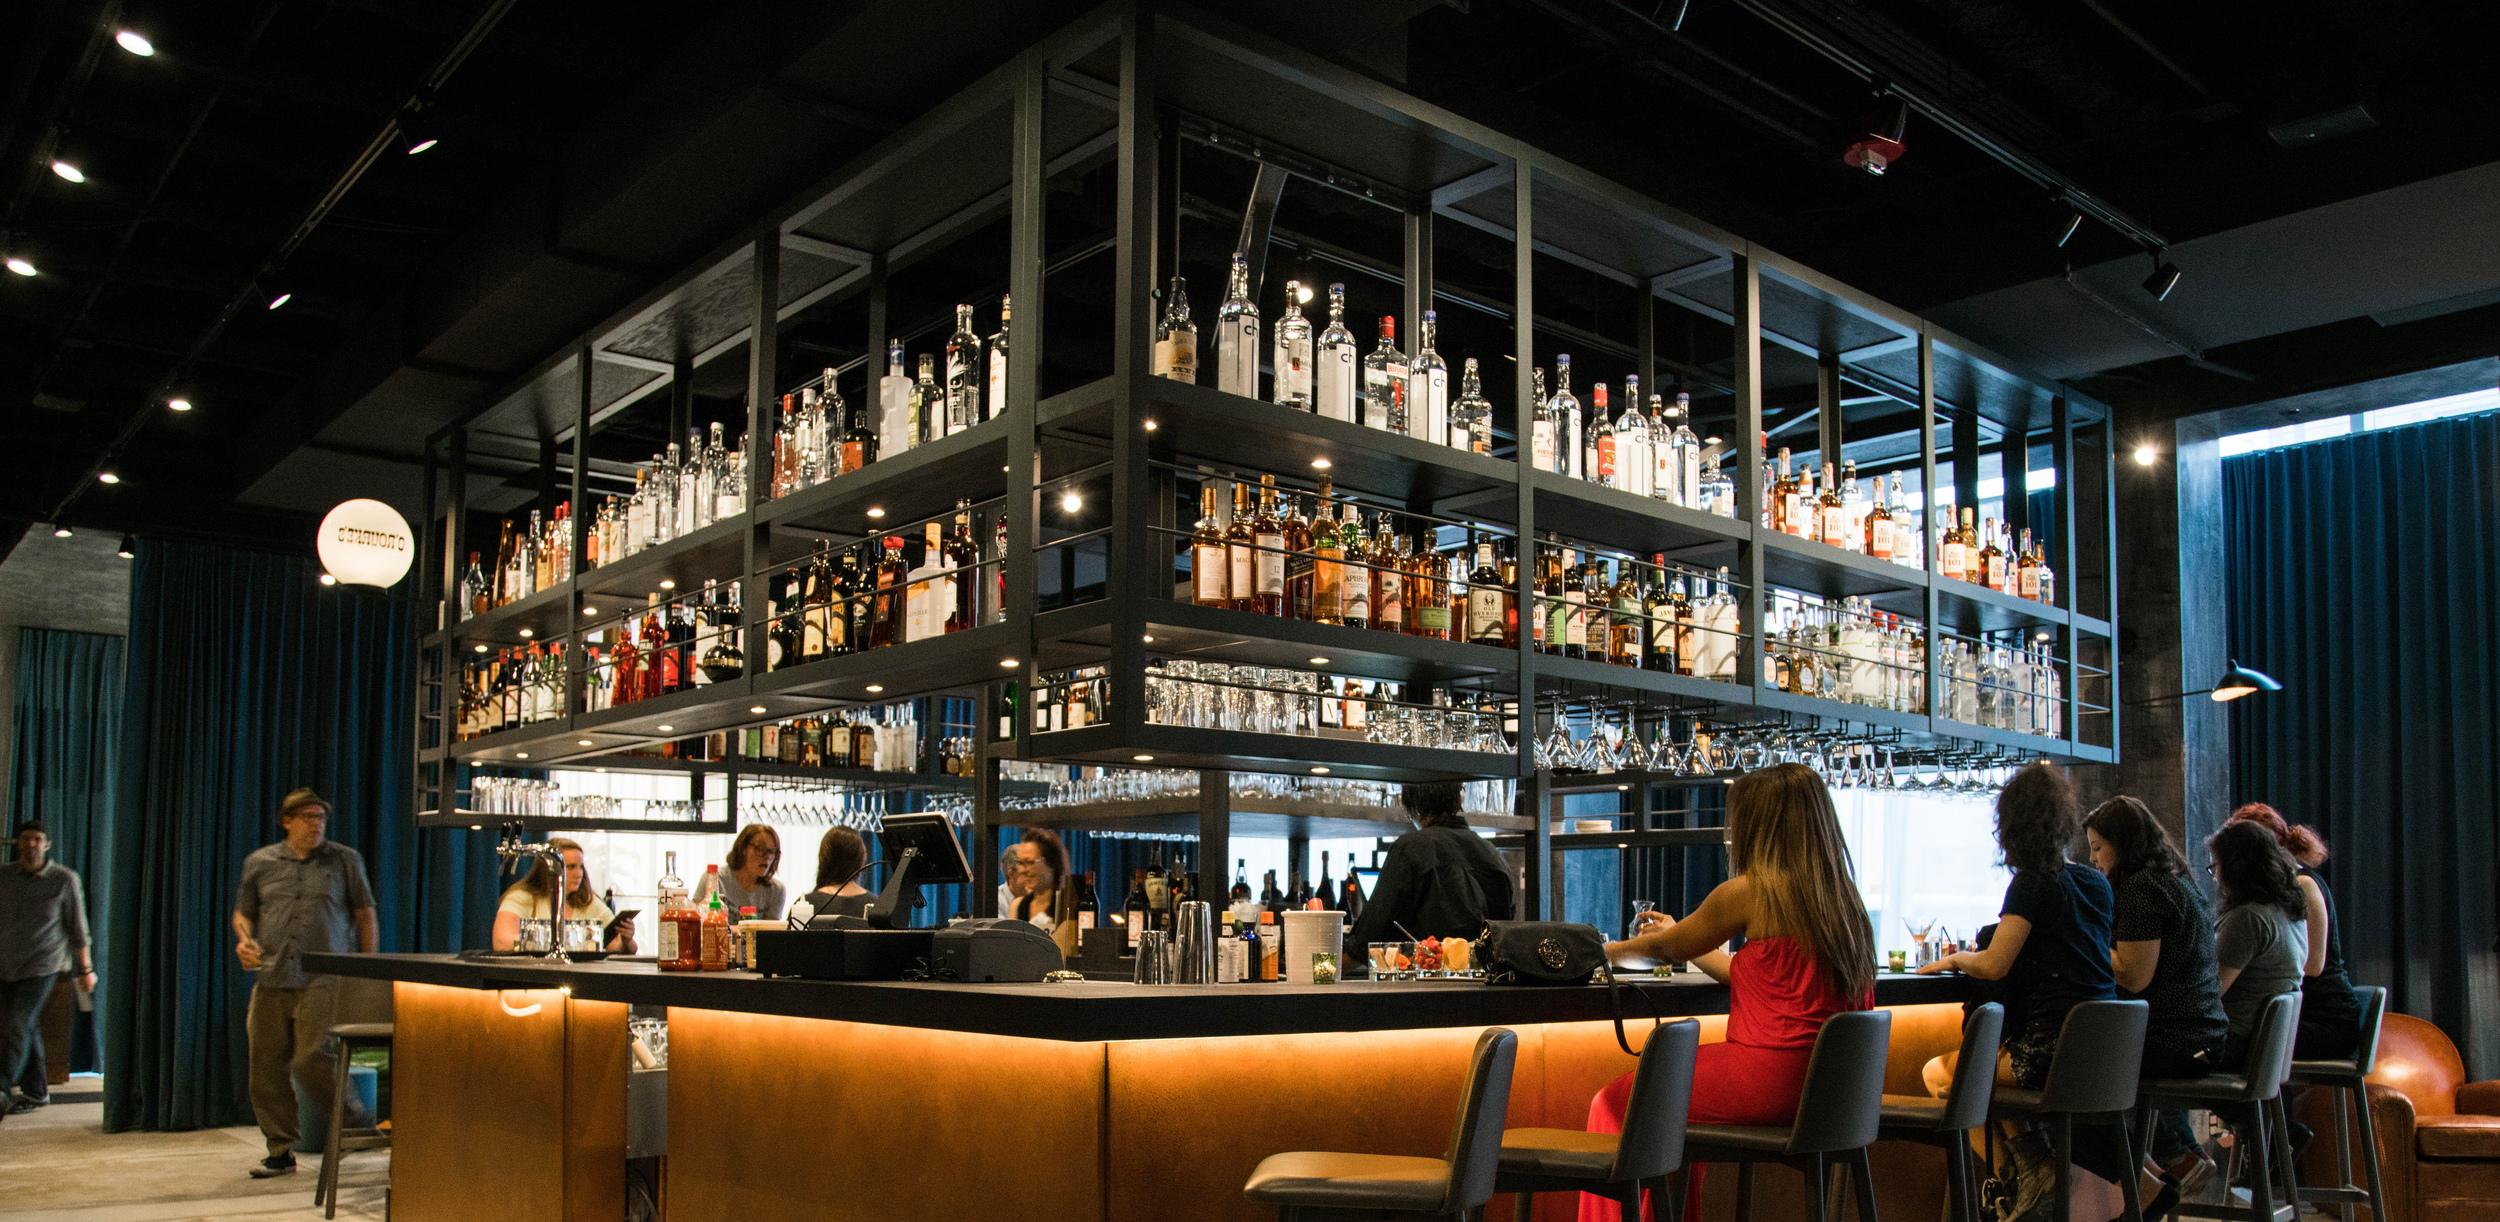 Bar Restaurant And Cafe